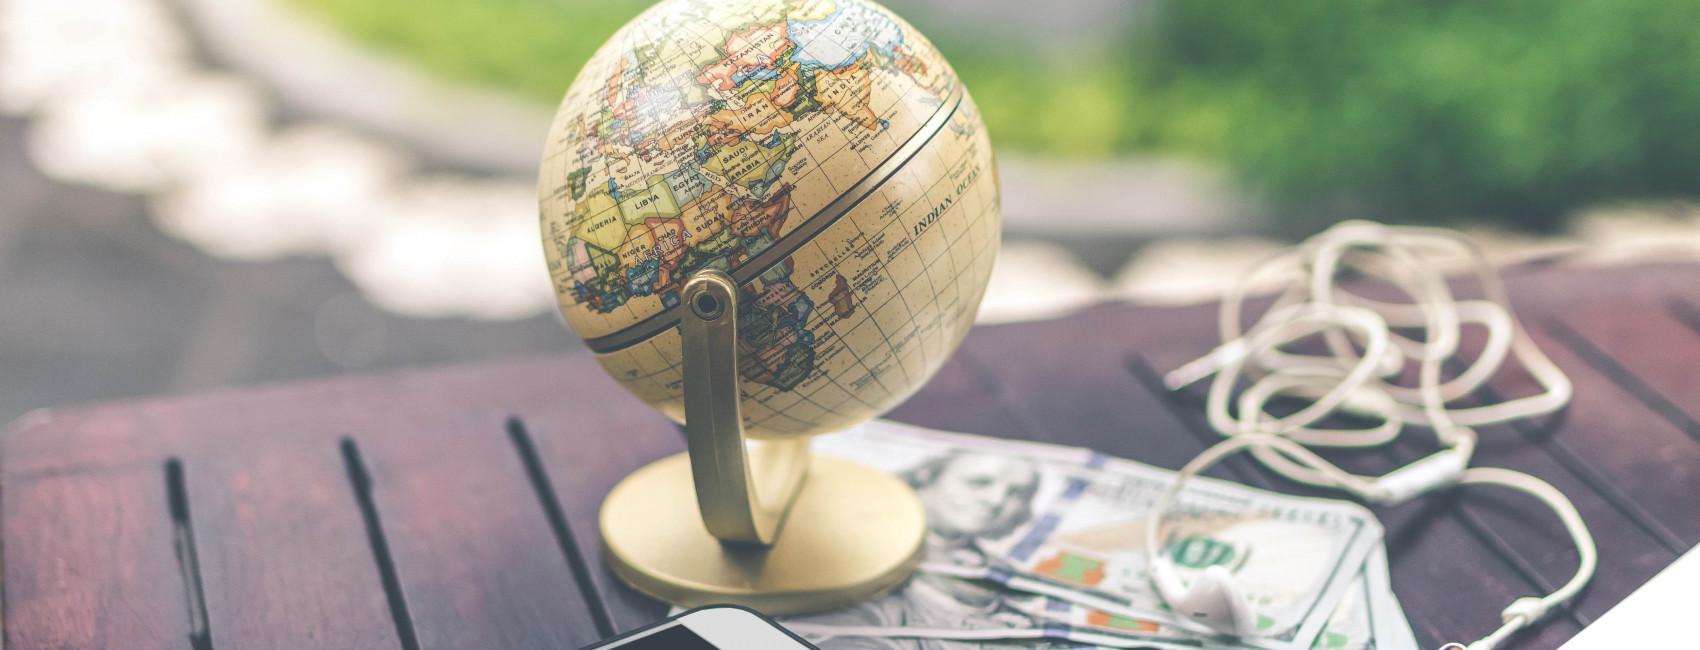 Guadagnare online viaggiando 1